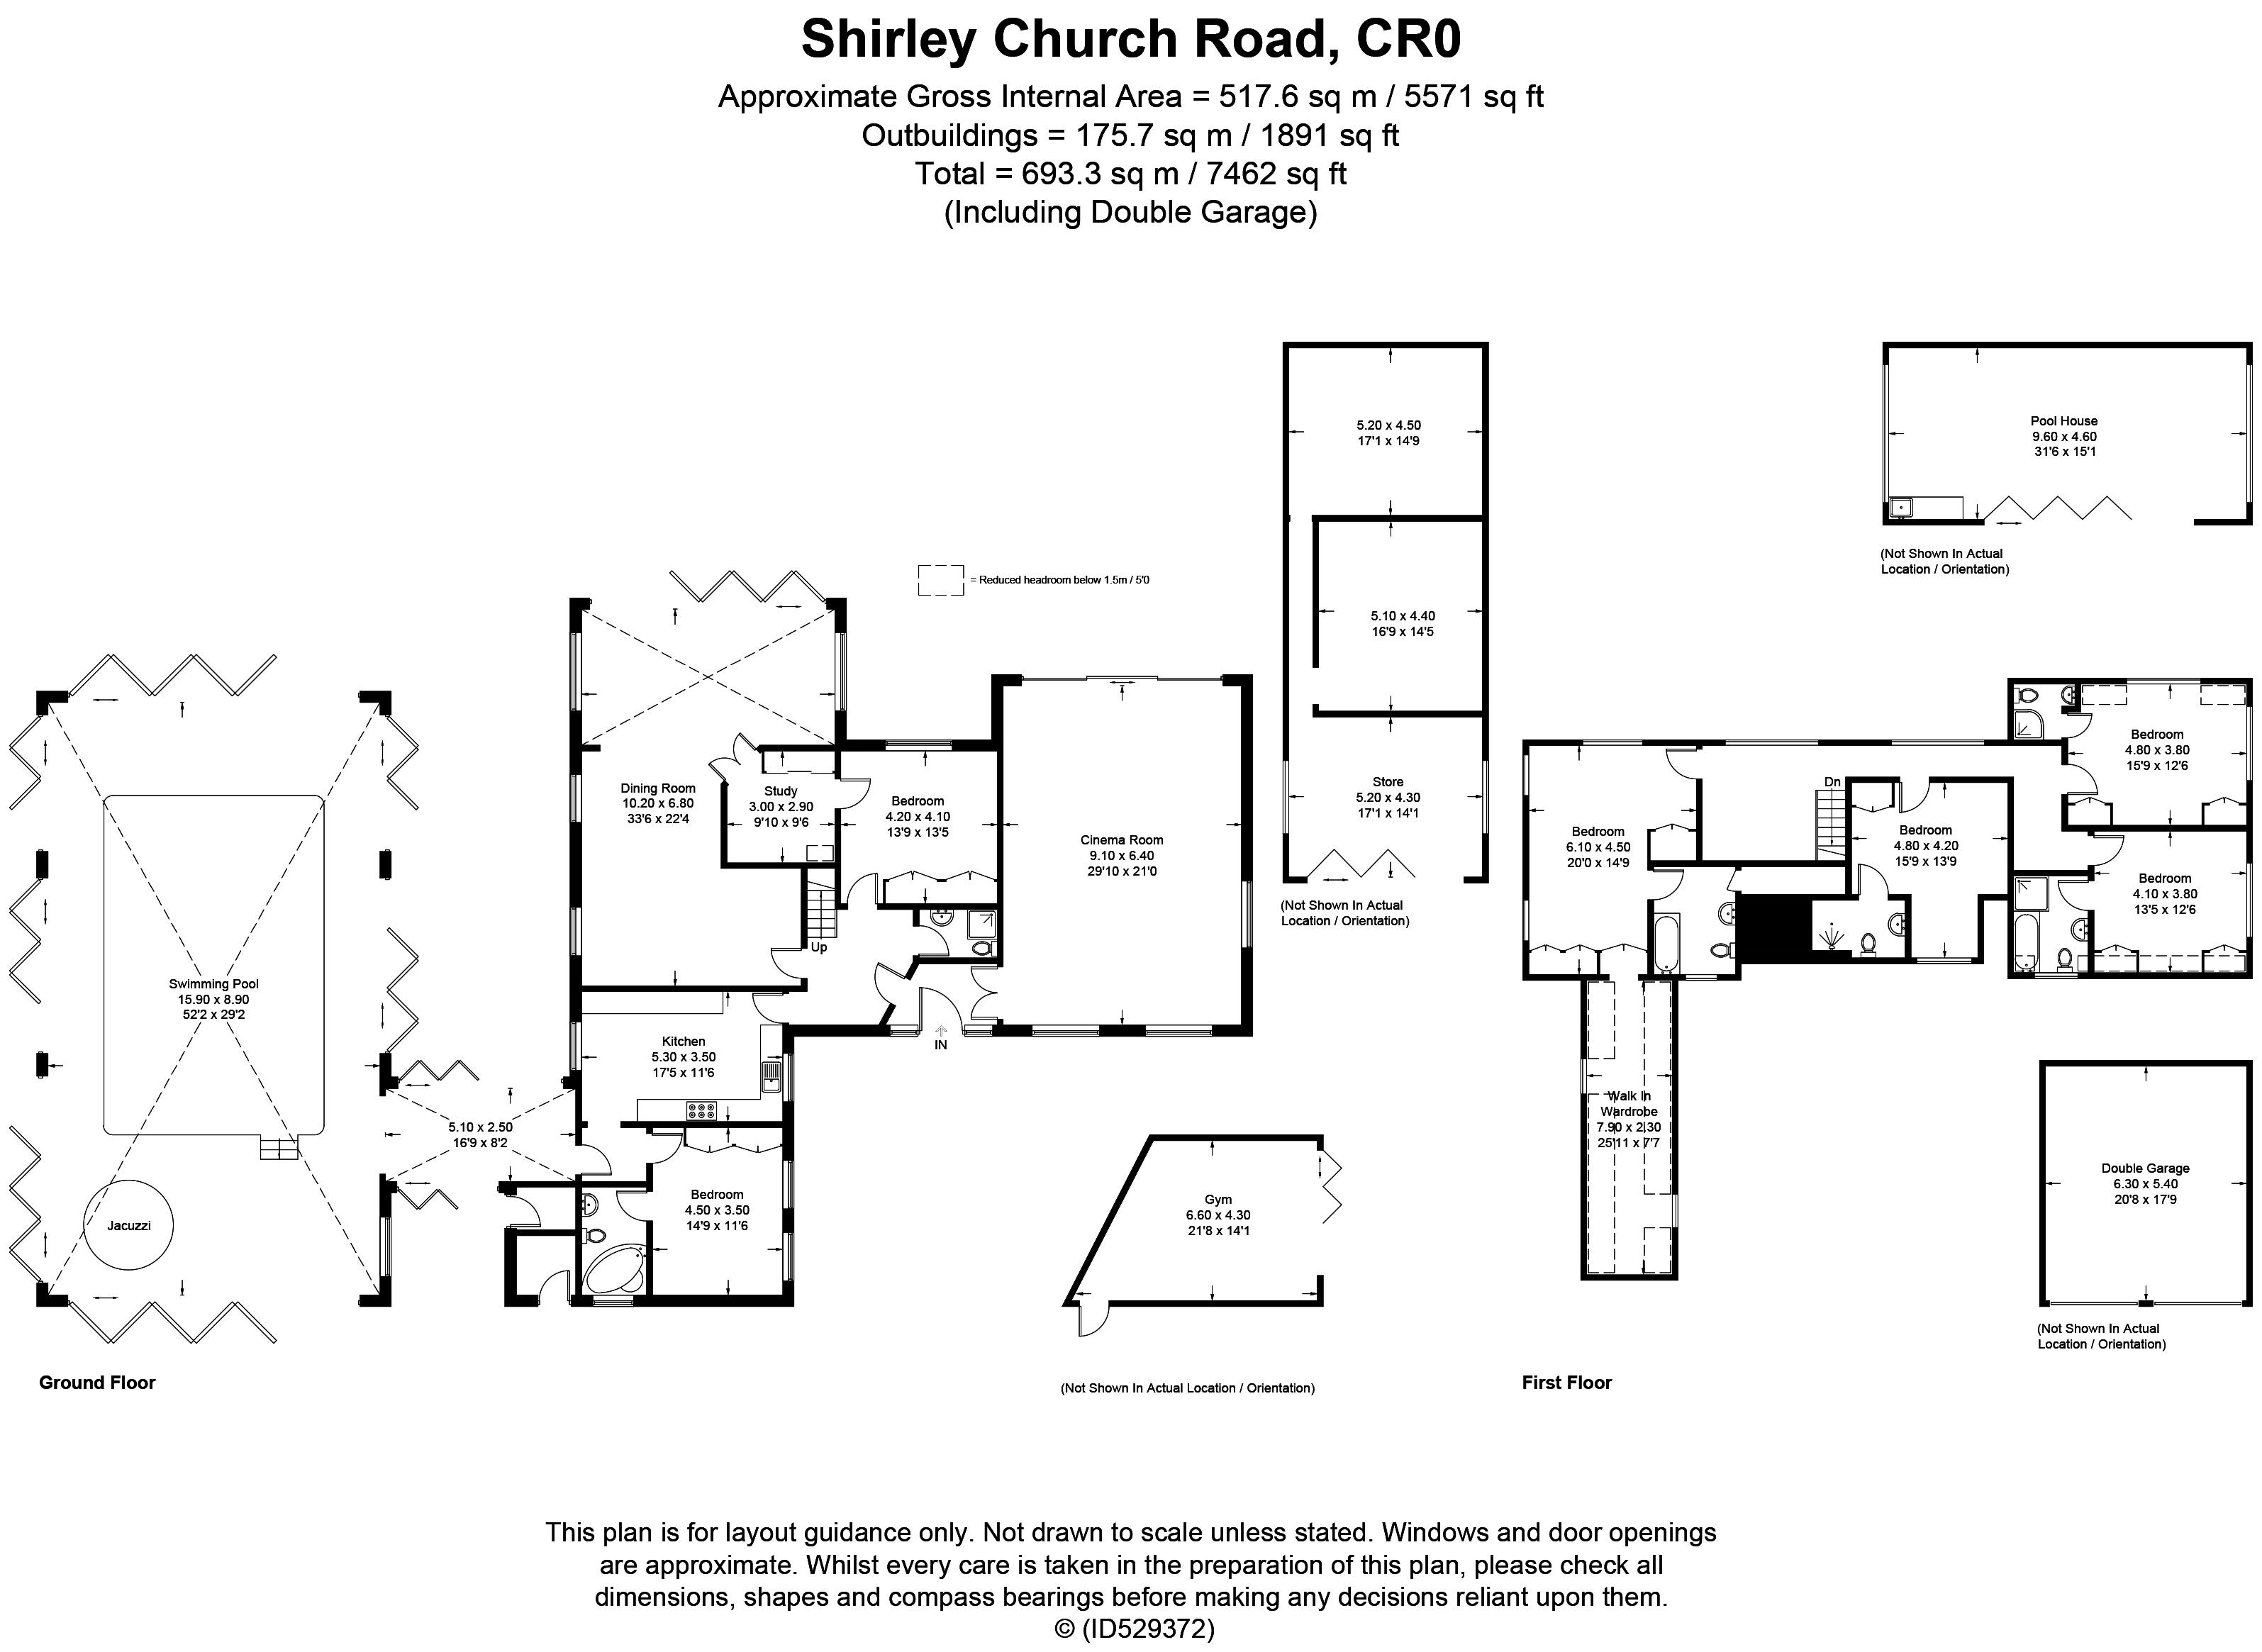 Shirley Church Road, Croydon CR0, 6 bedroom detached house